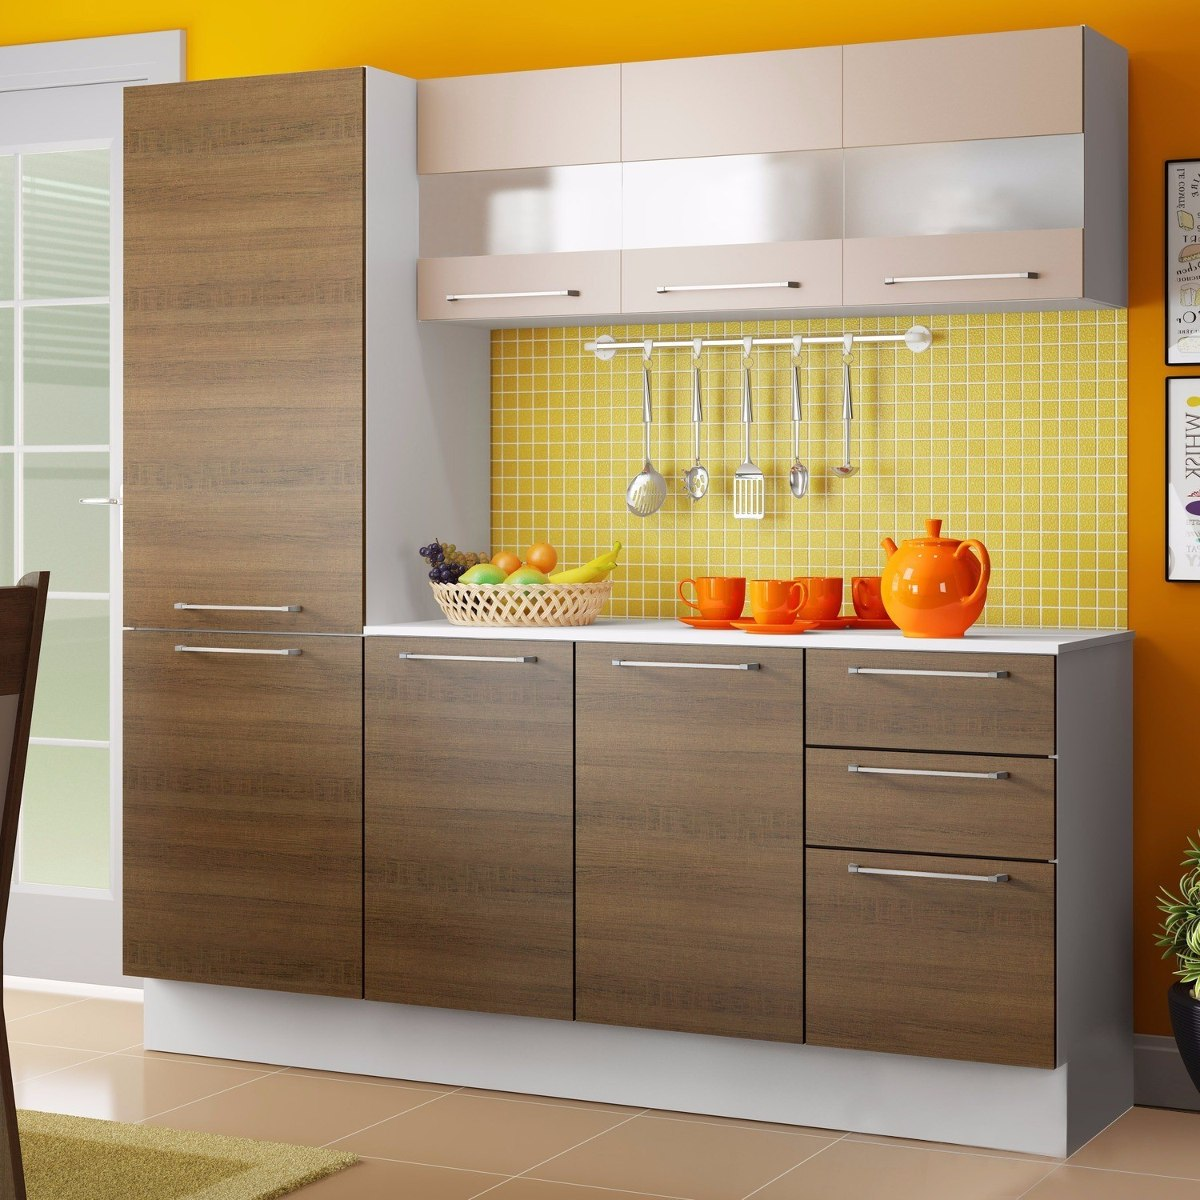 Cozinha Completa Lara Madesa Branco Rustic Crema Ea R 649 90 Em